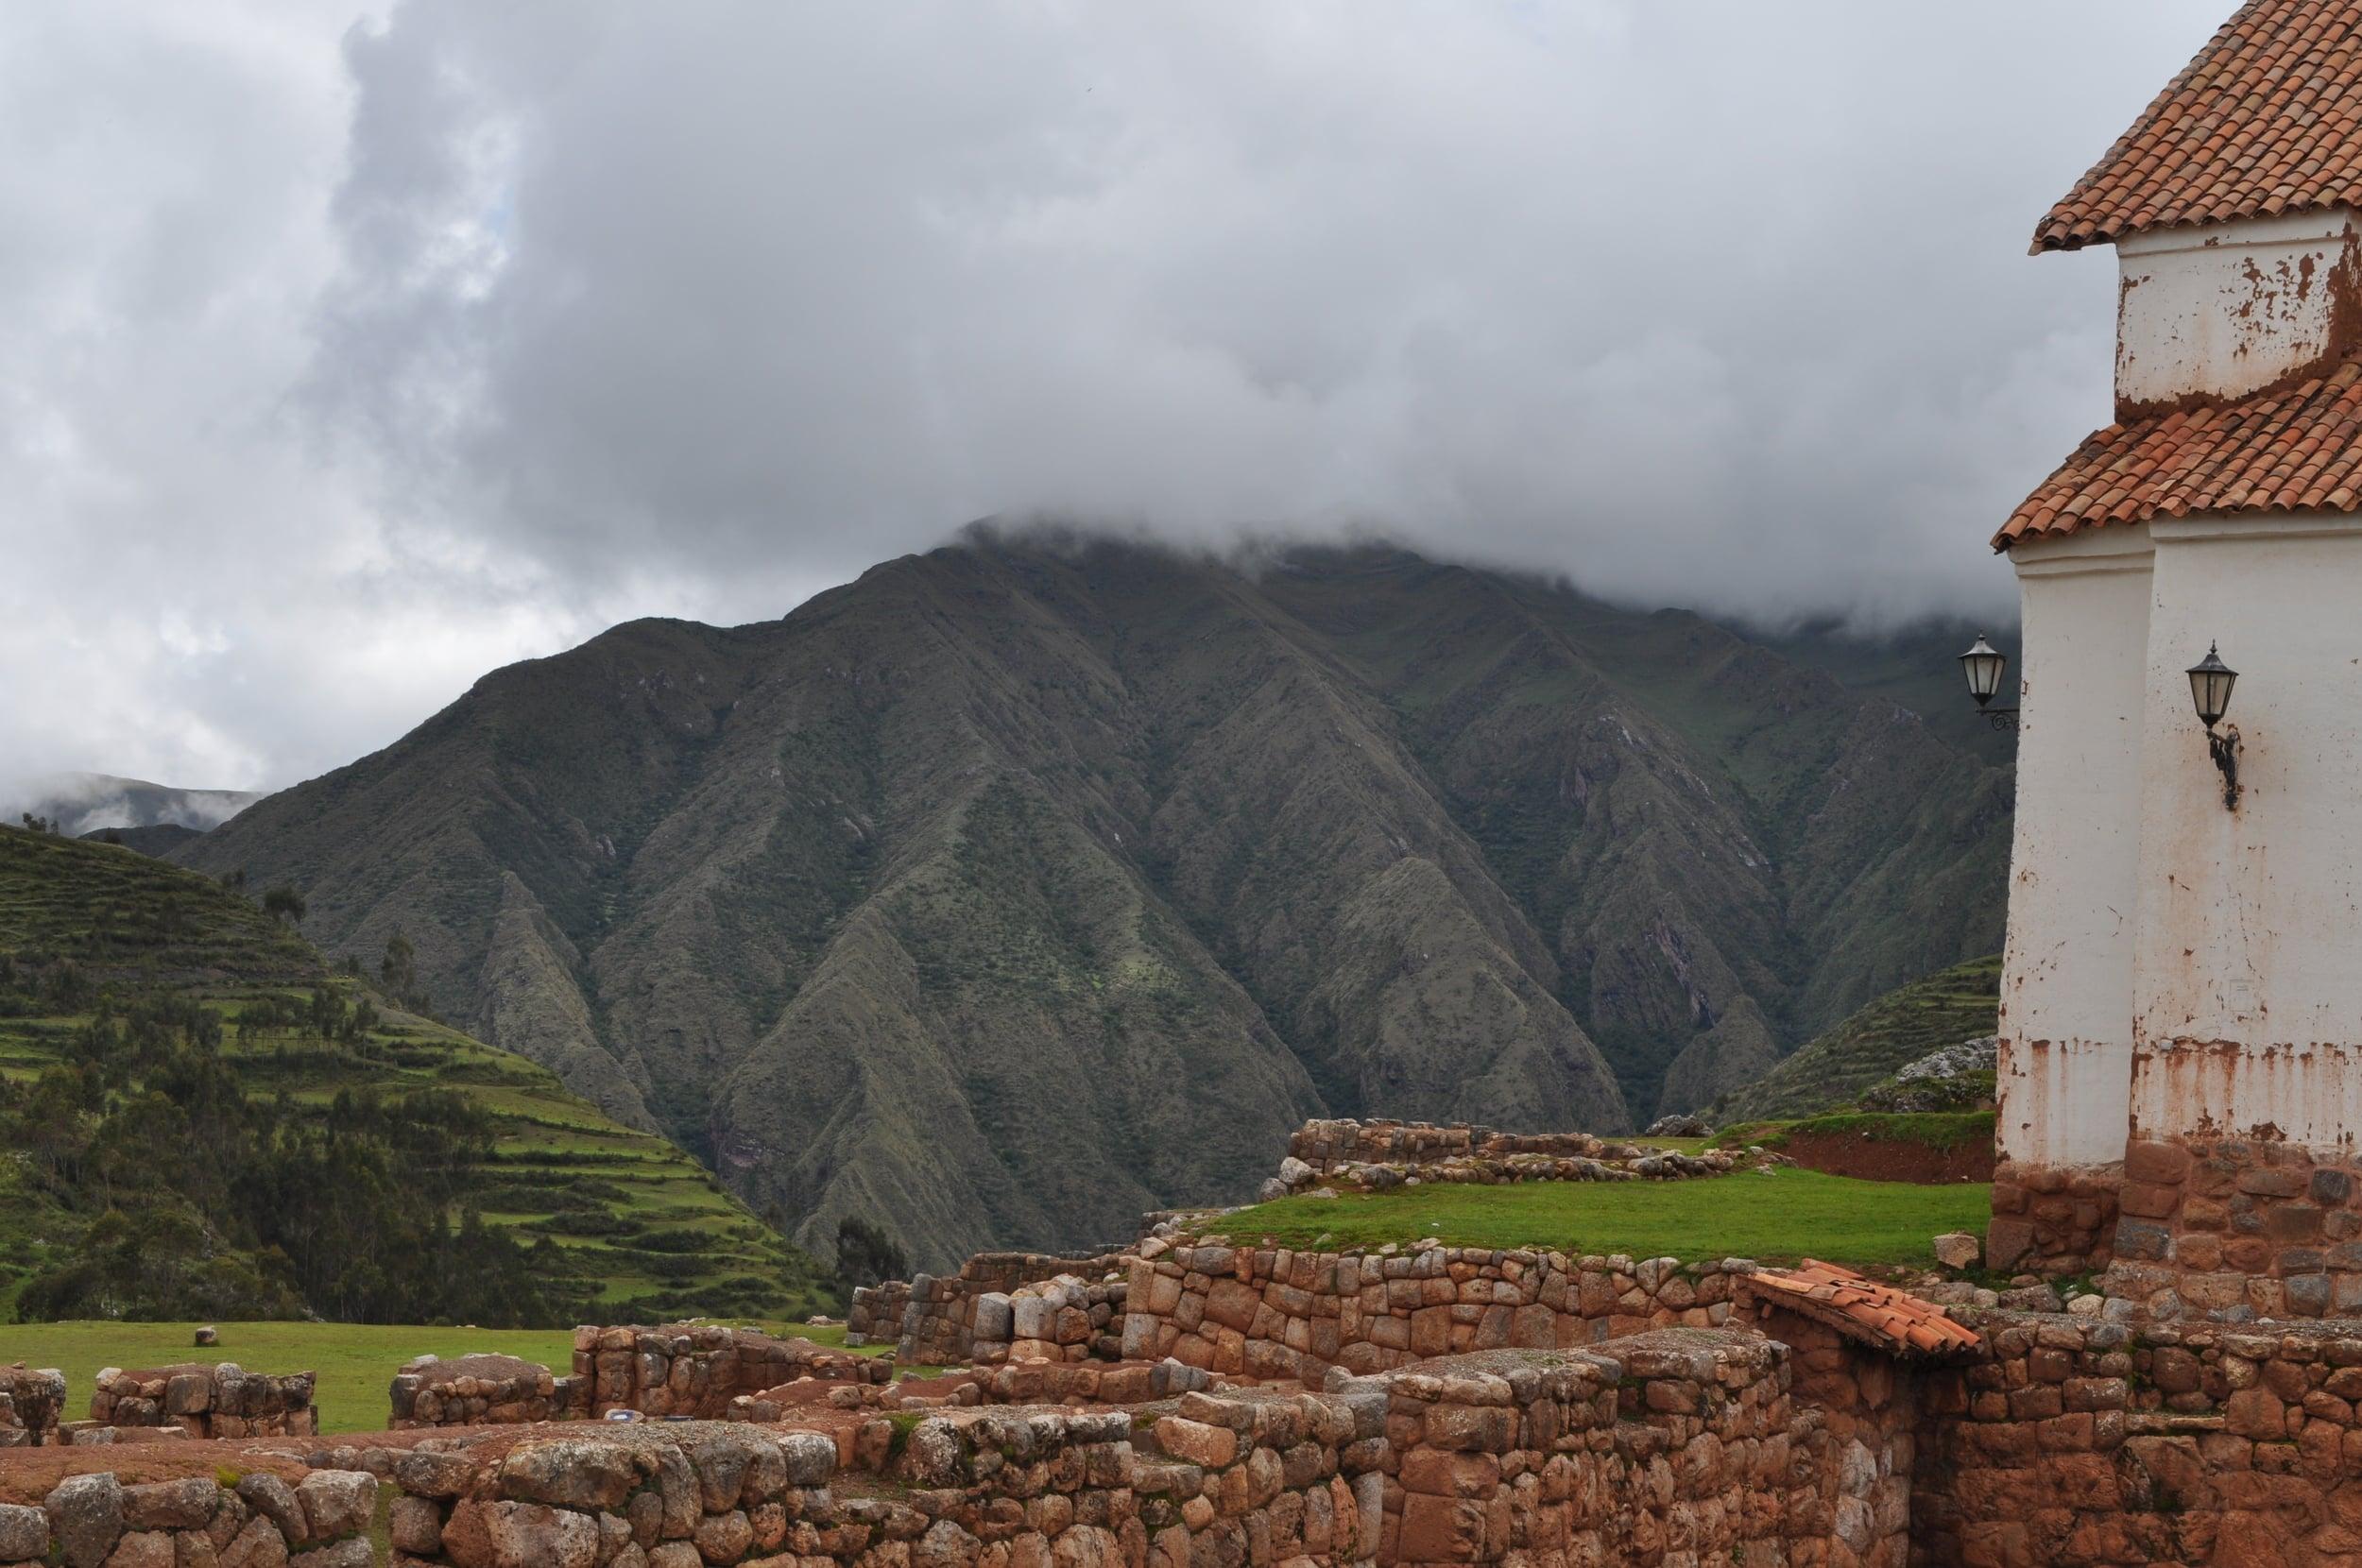 To the Incas, Chinchero was the birthplace of the rainbow. Photo: Pamy Rojas